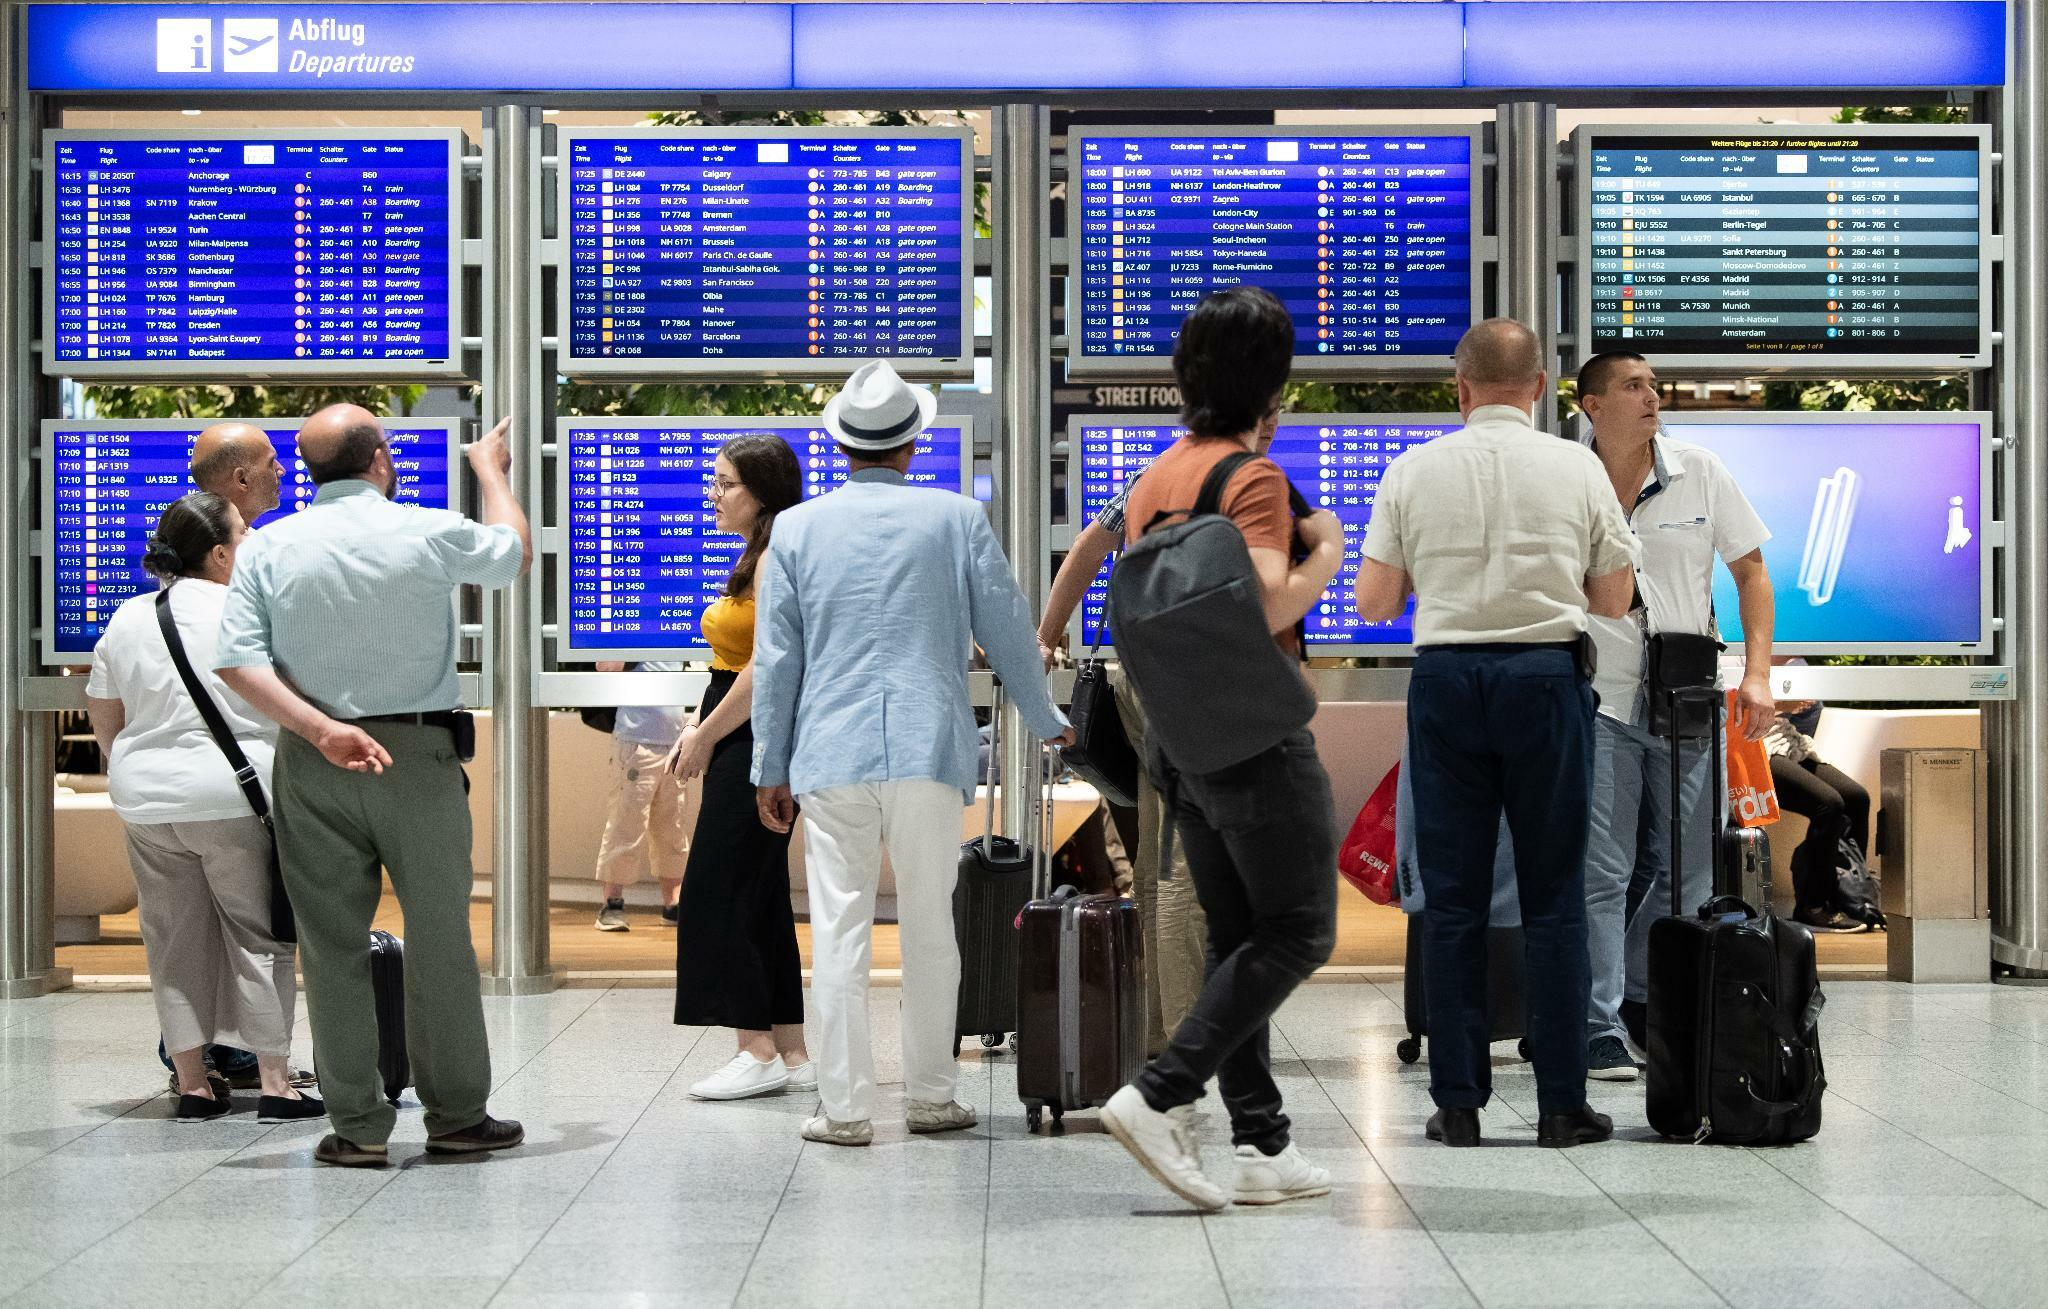 Flugverkehr in Frankfurt wächst im September langsamer